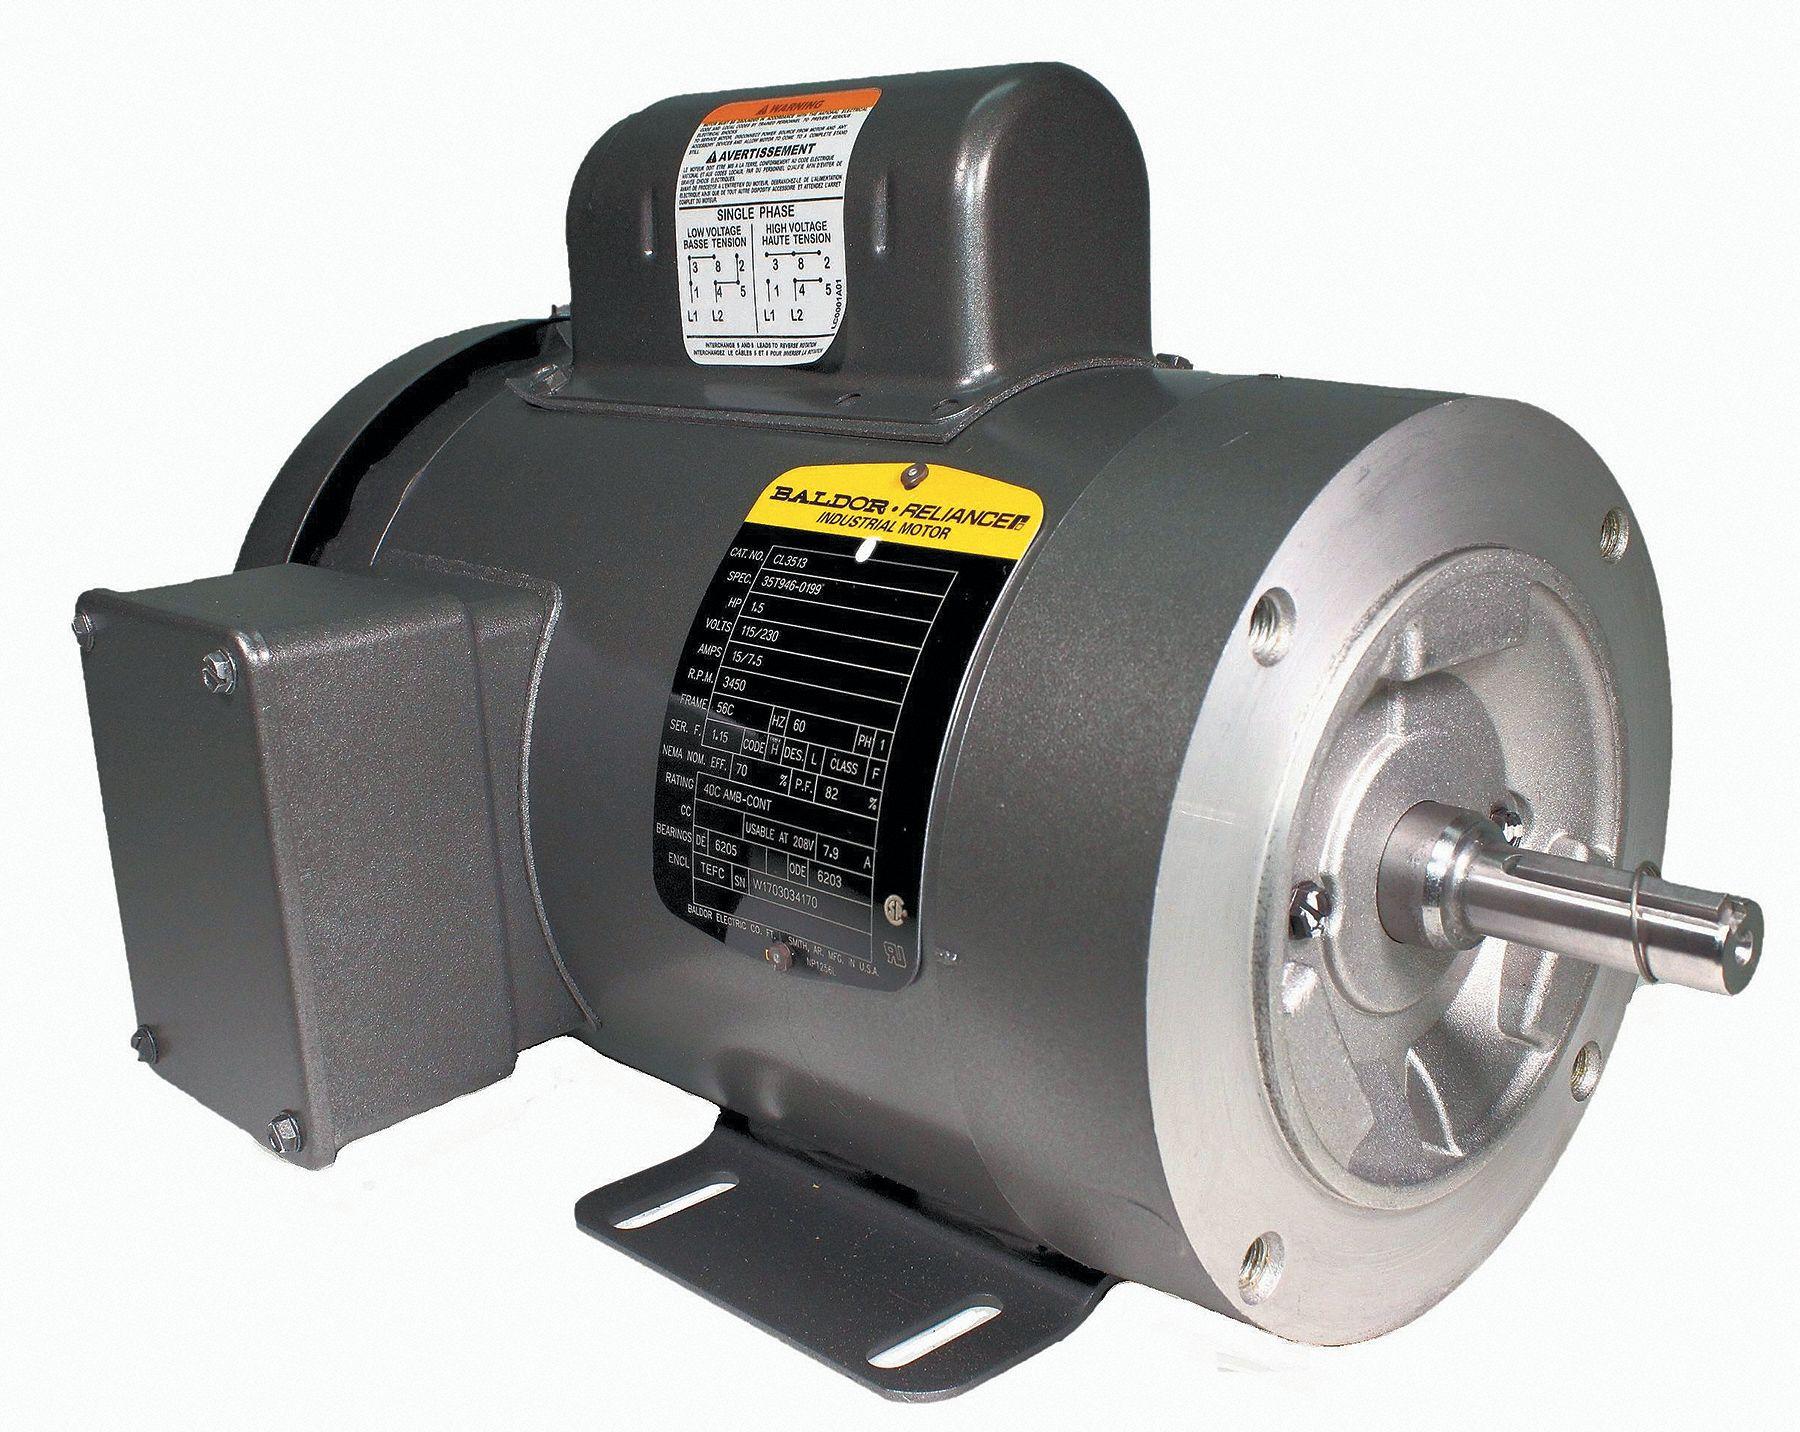 Baldor Electric Motor 1 1 2 Hp 3450 Rpm 115 230v 56c